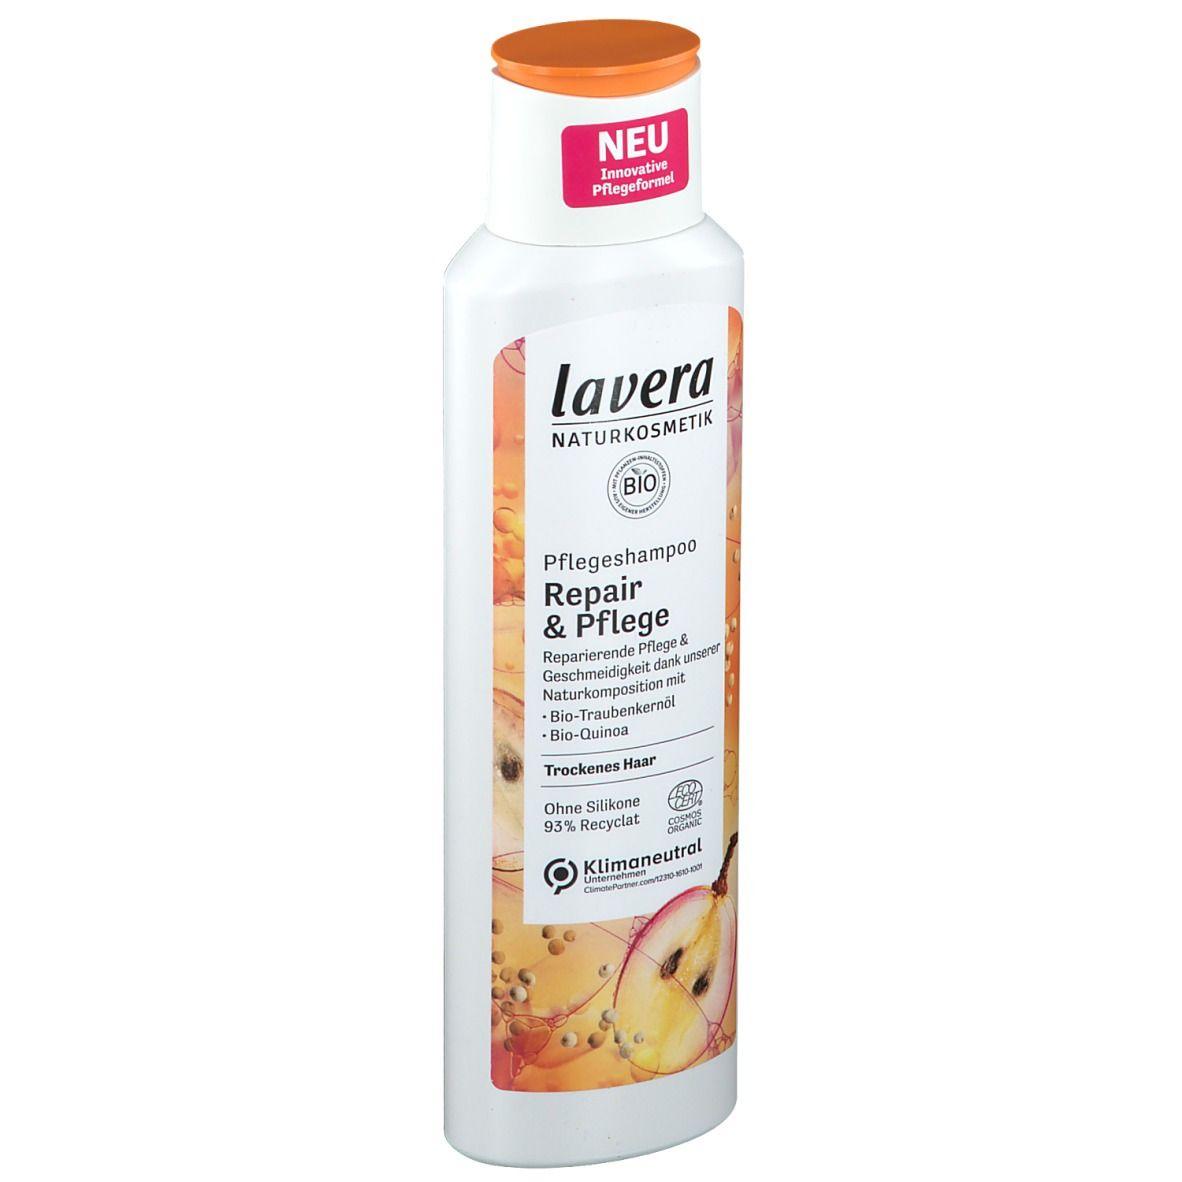 lavera Pflegeshampoo Repair & Pflege